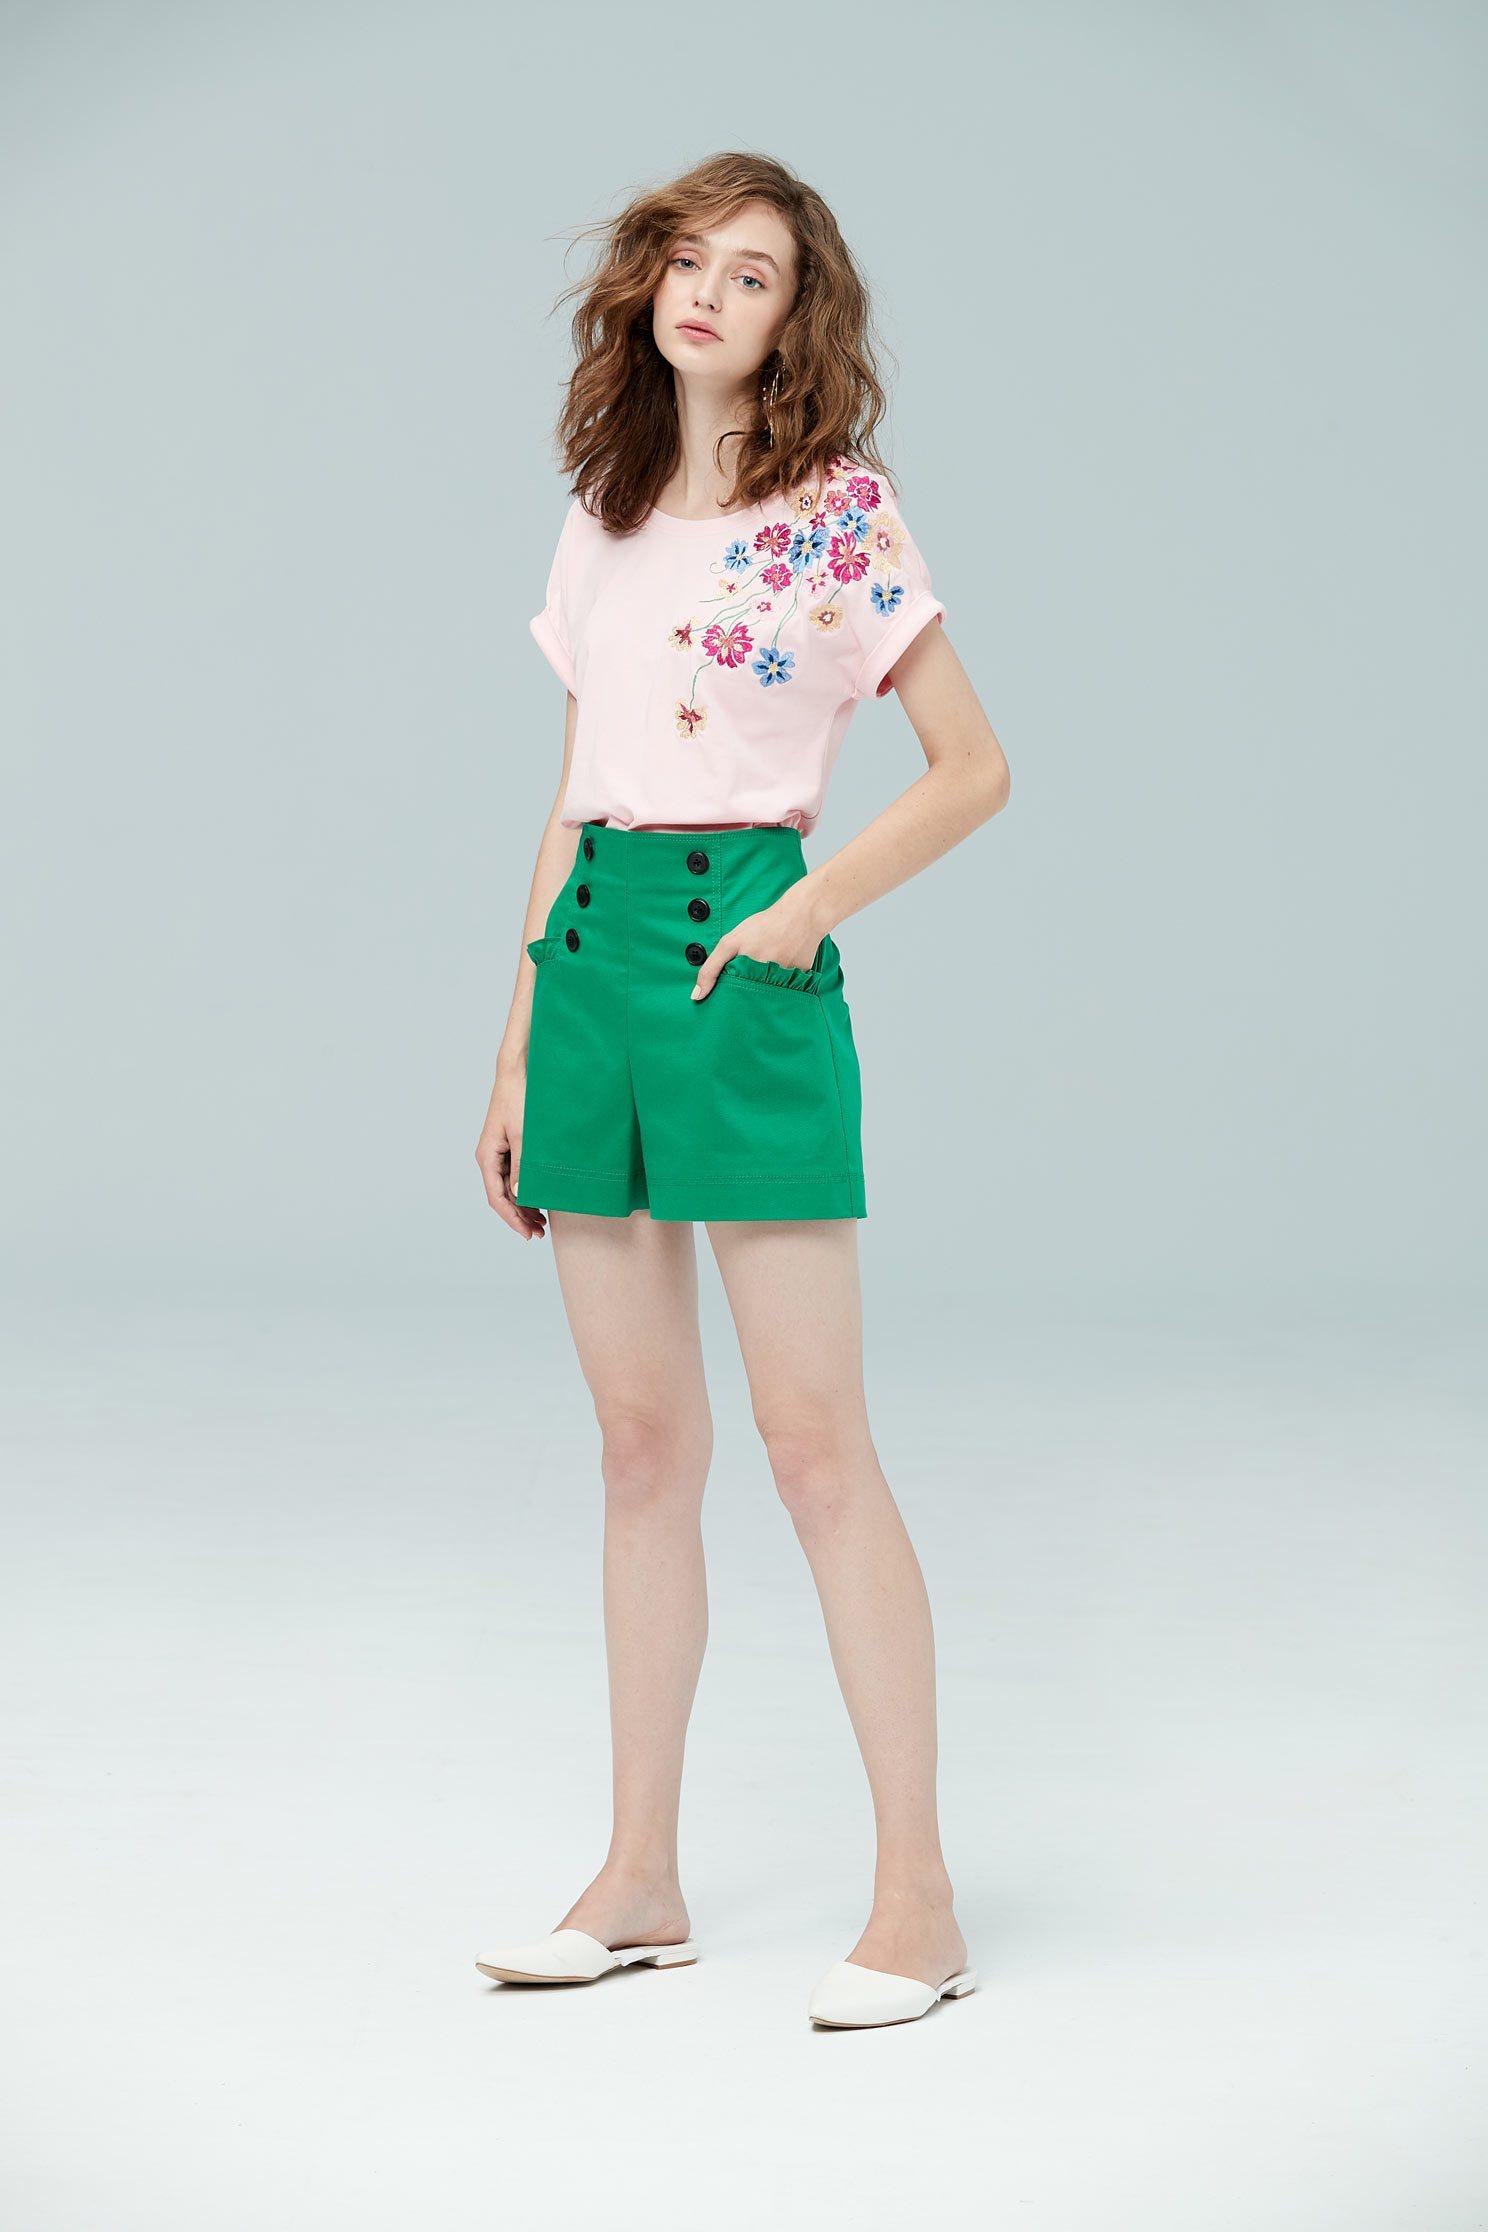 Elegant embroidered cotton T-shirt